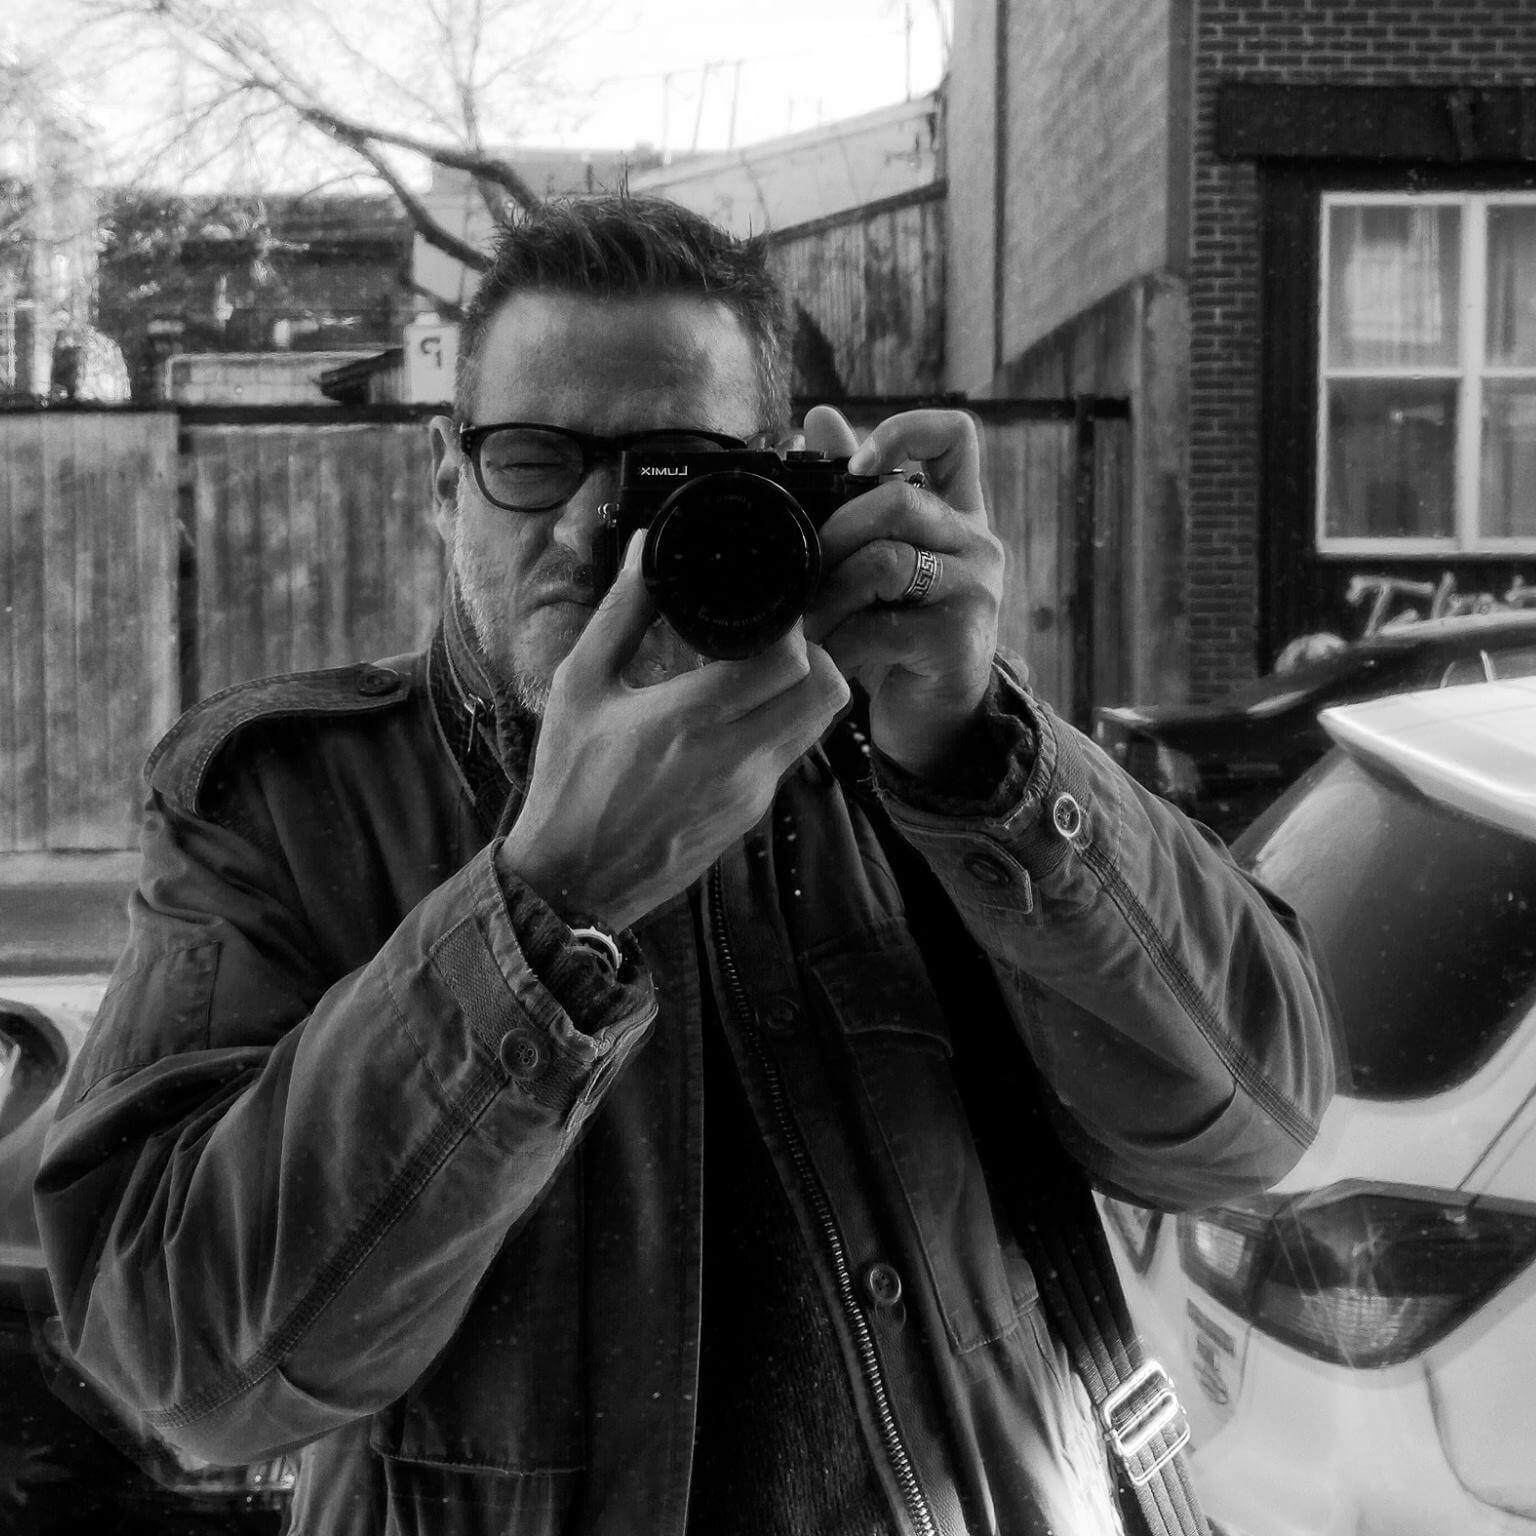 Photographe Steeve Duguay